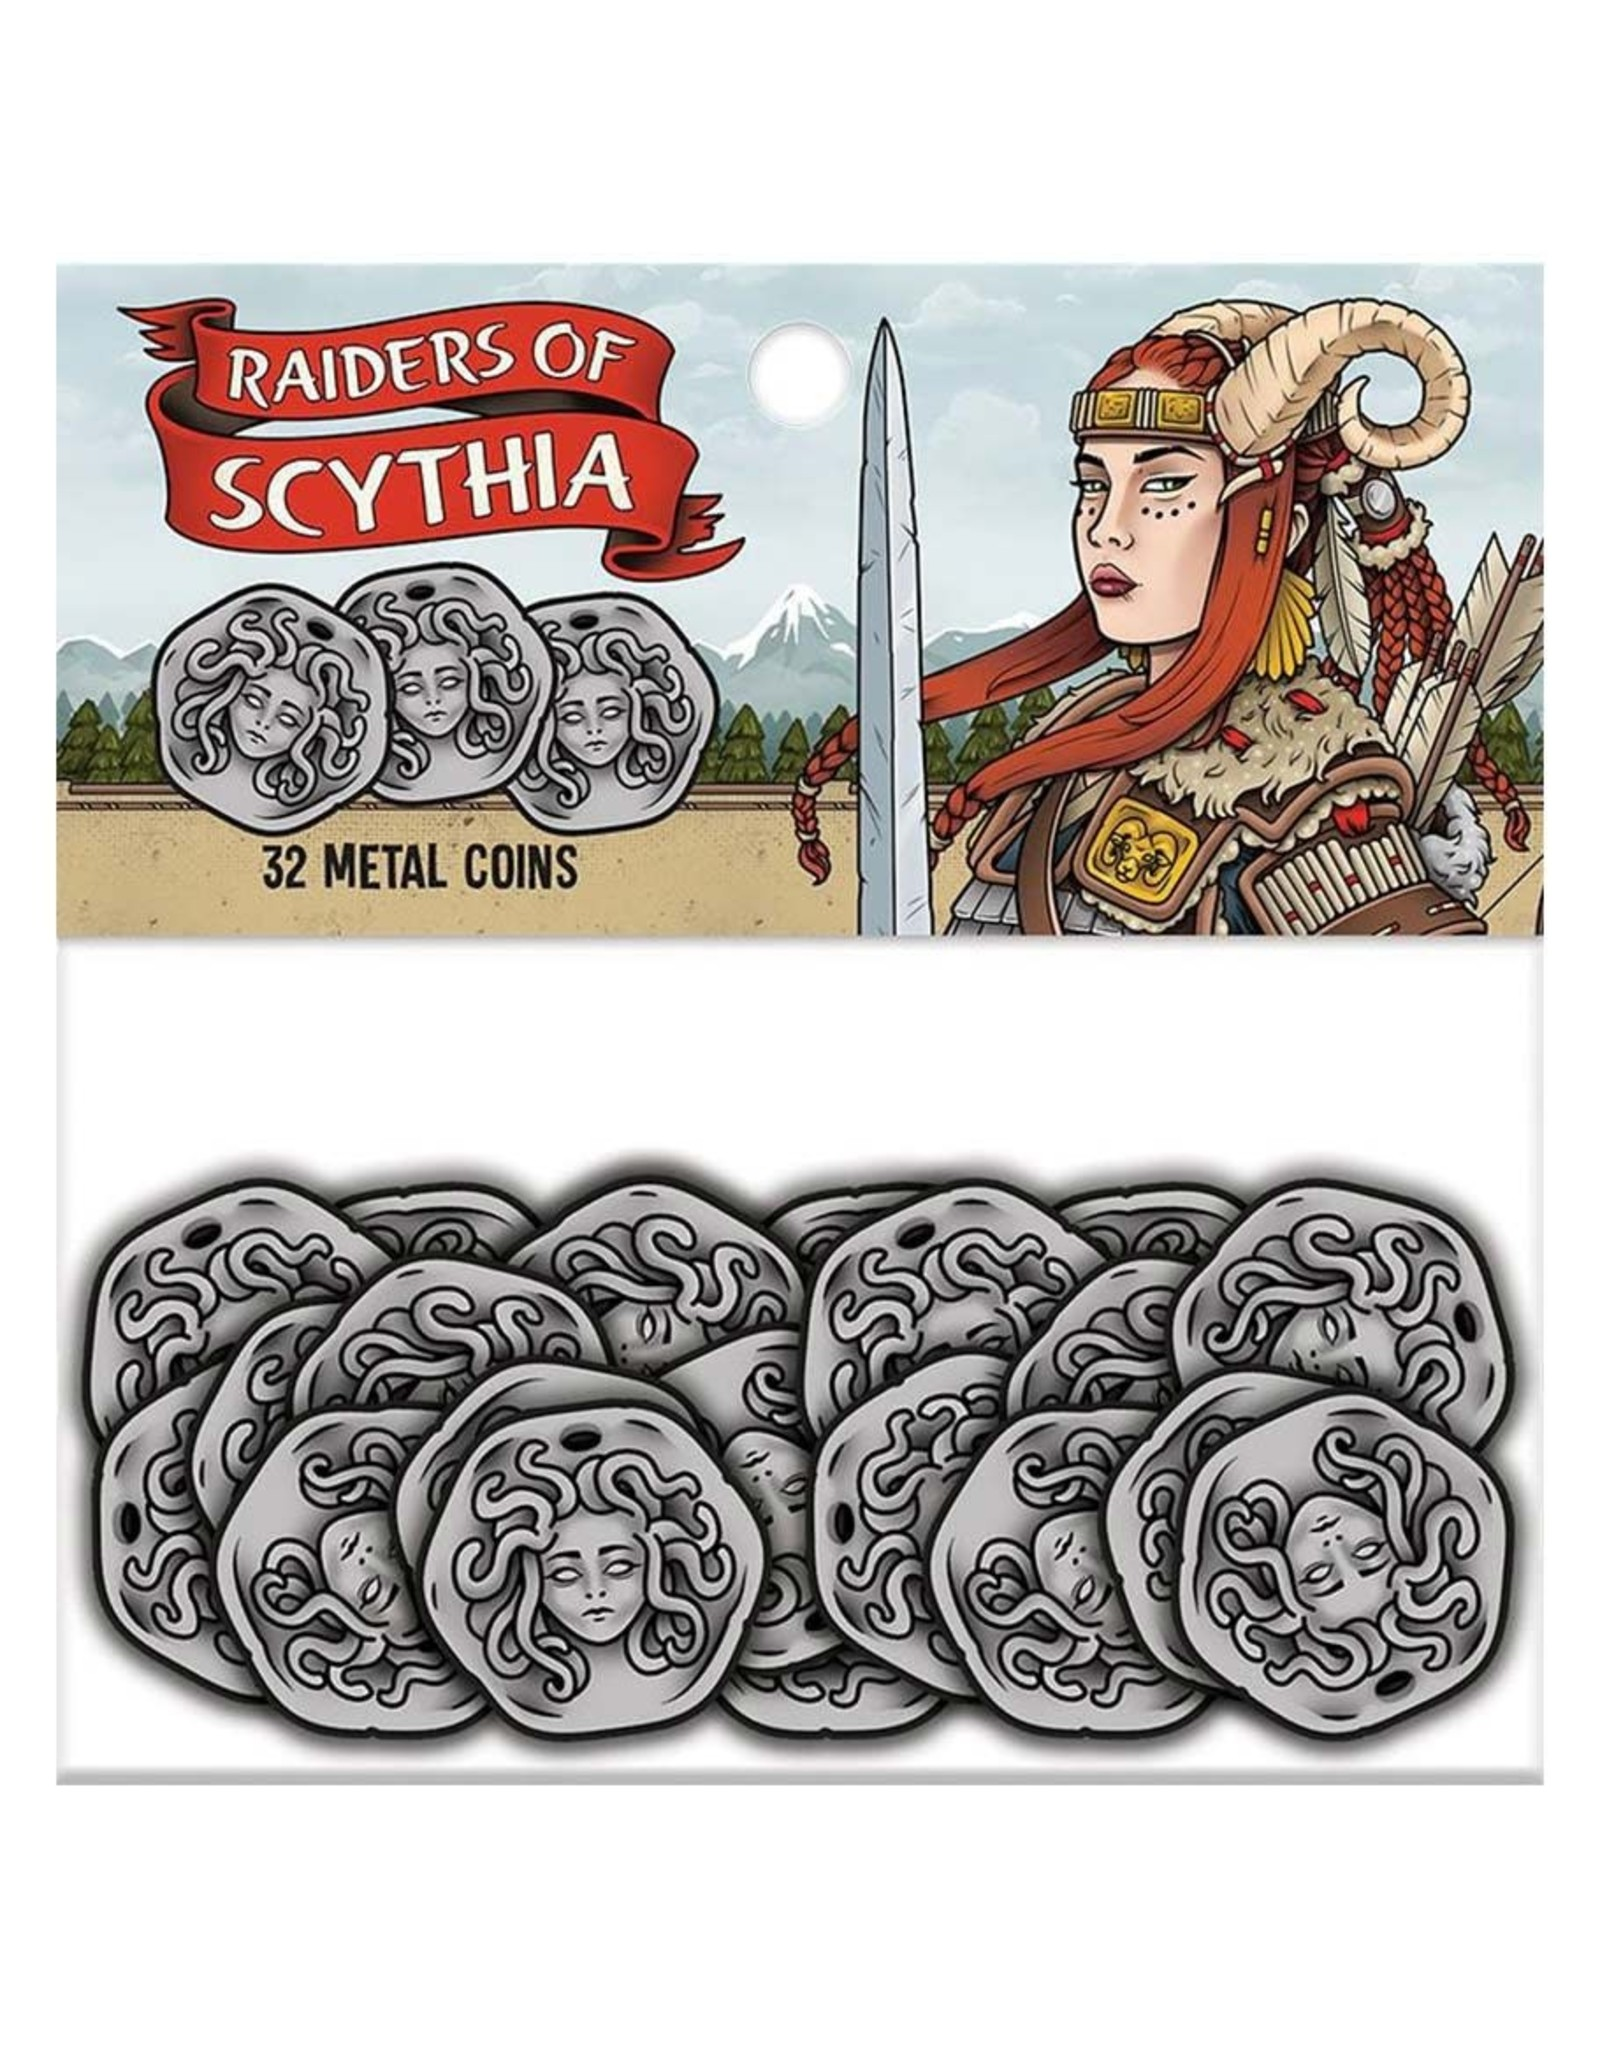 Renegade Raiders of Scythia: Metal Coins (32)